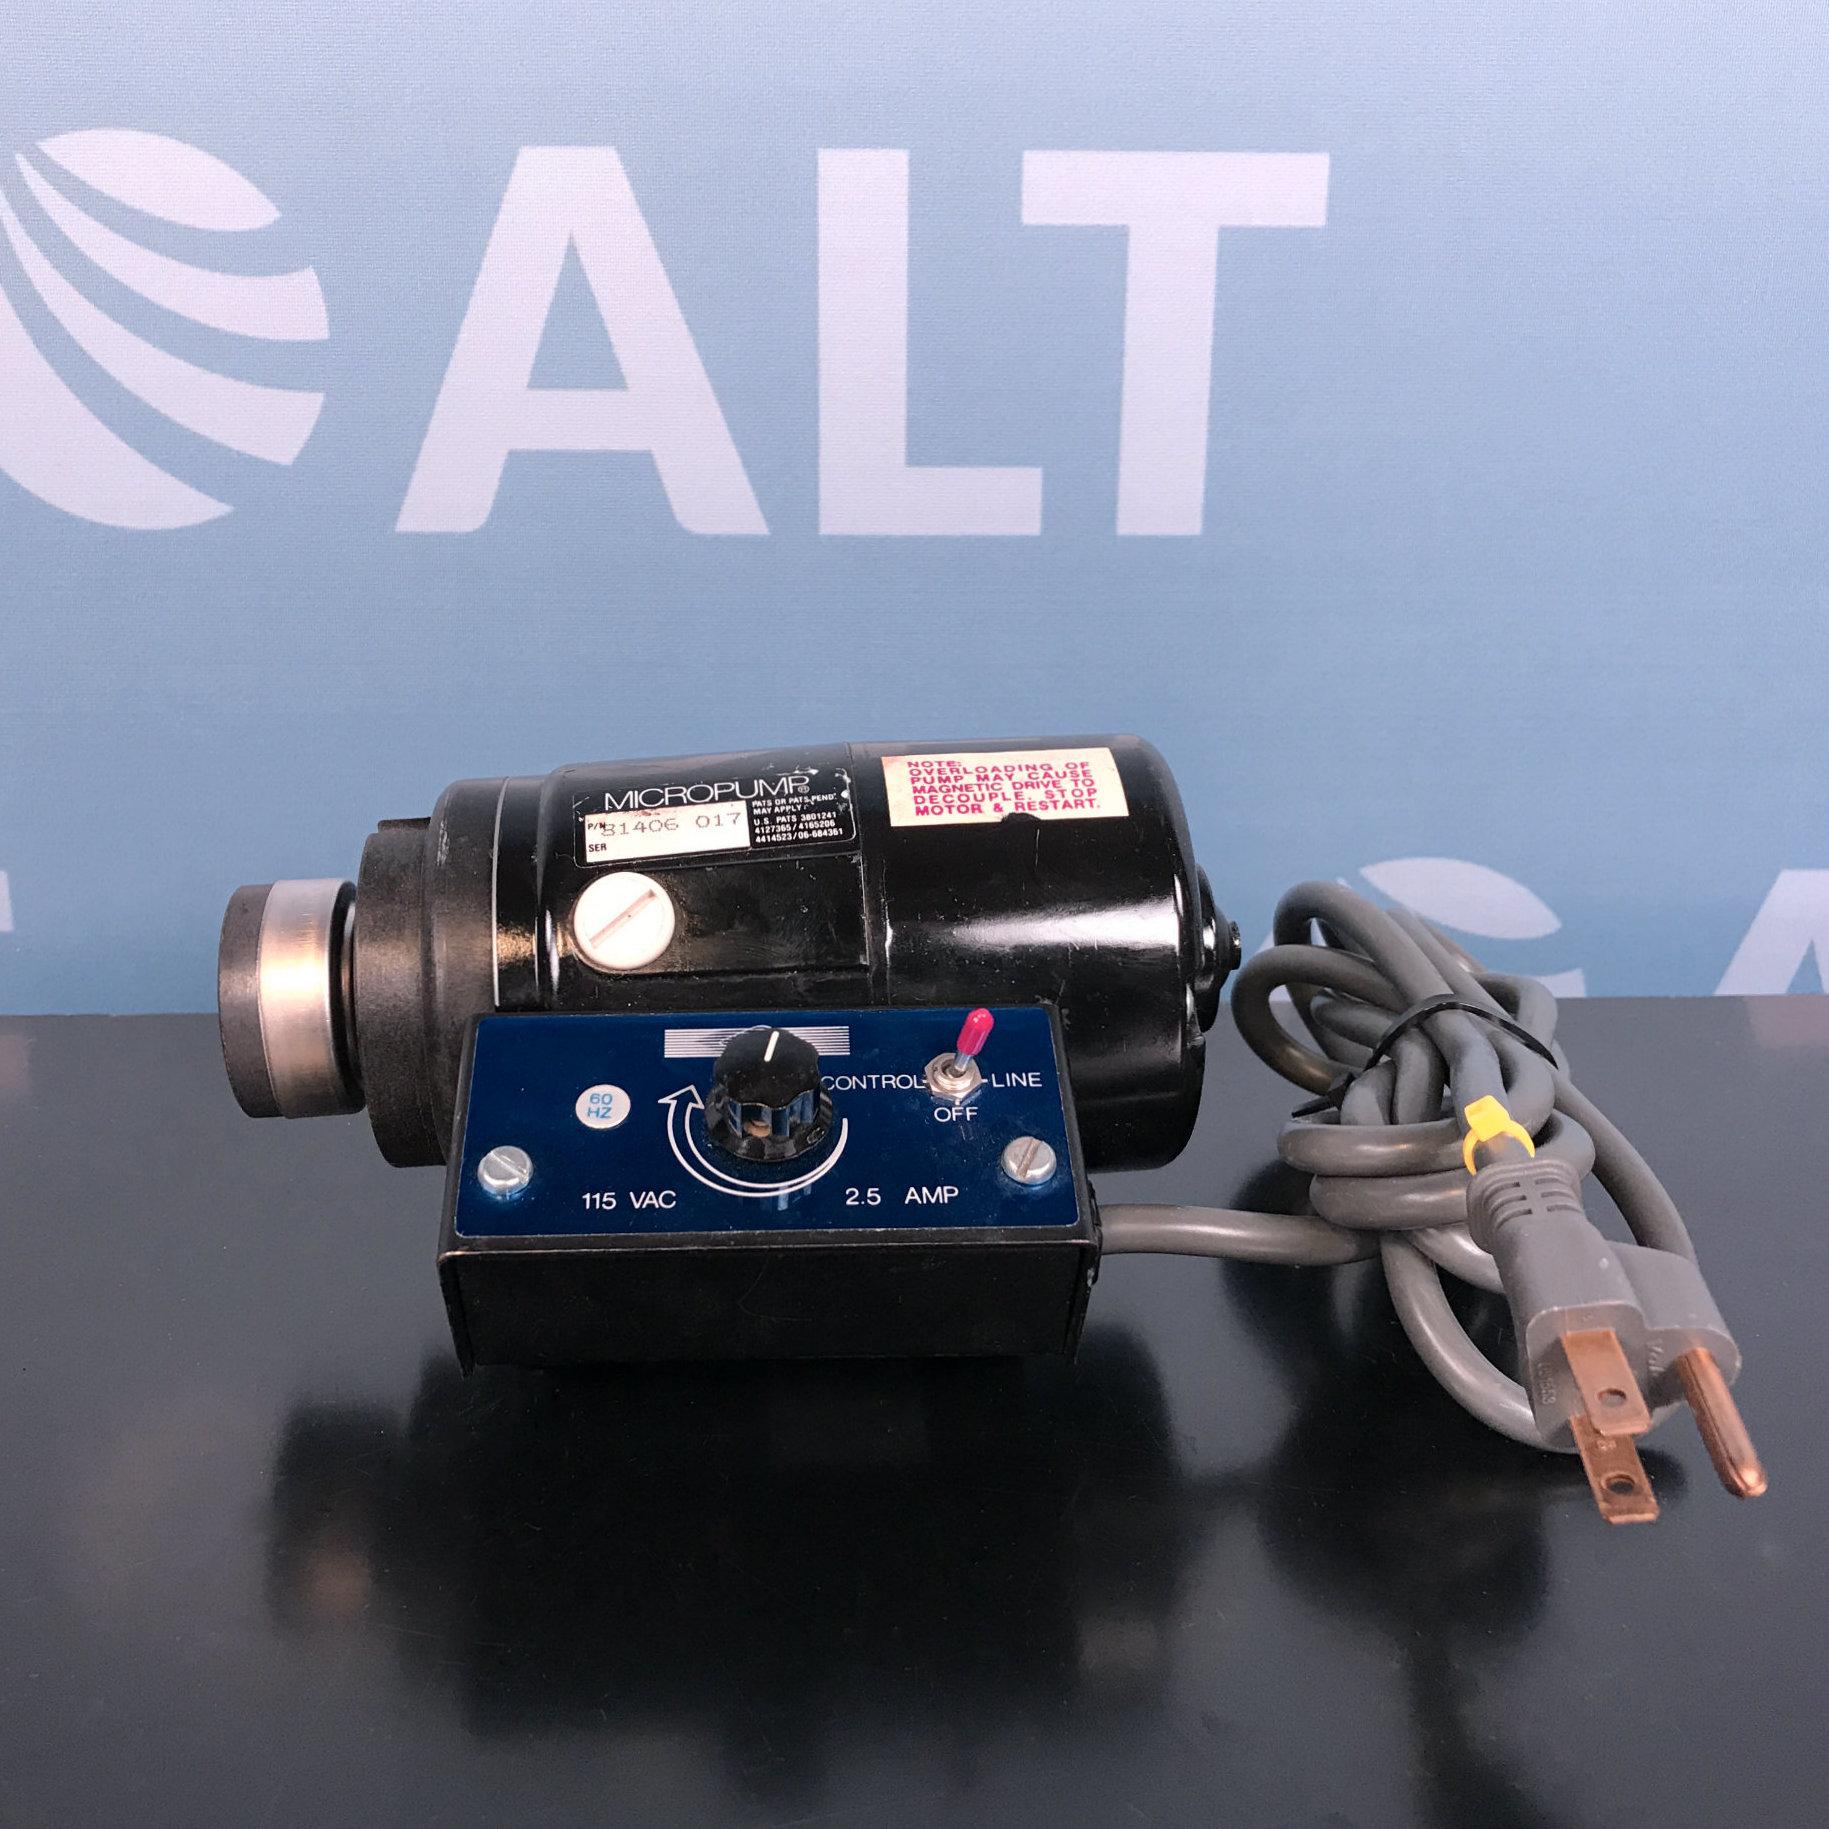 Micropump Model 12286-115-R168 Image